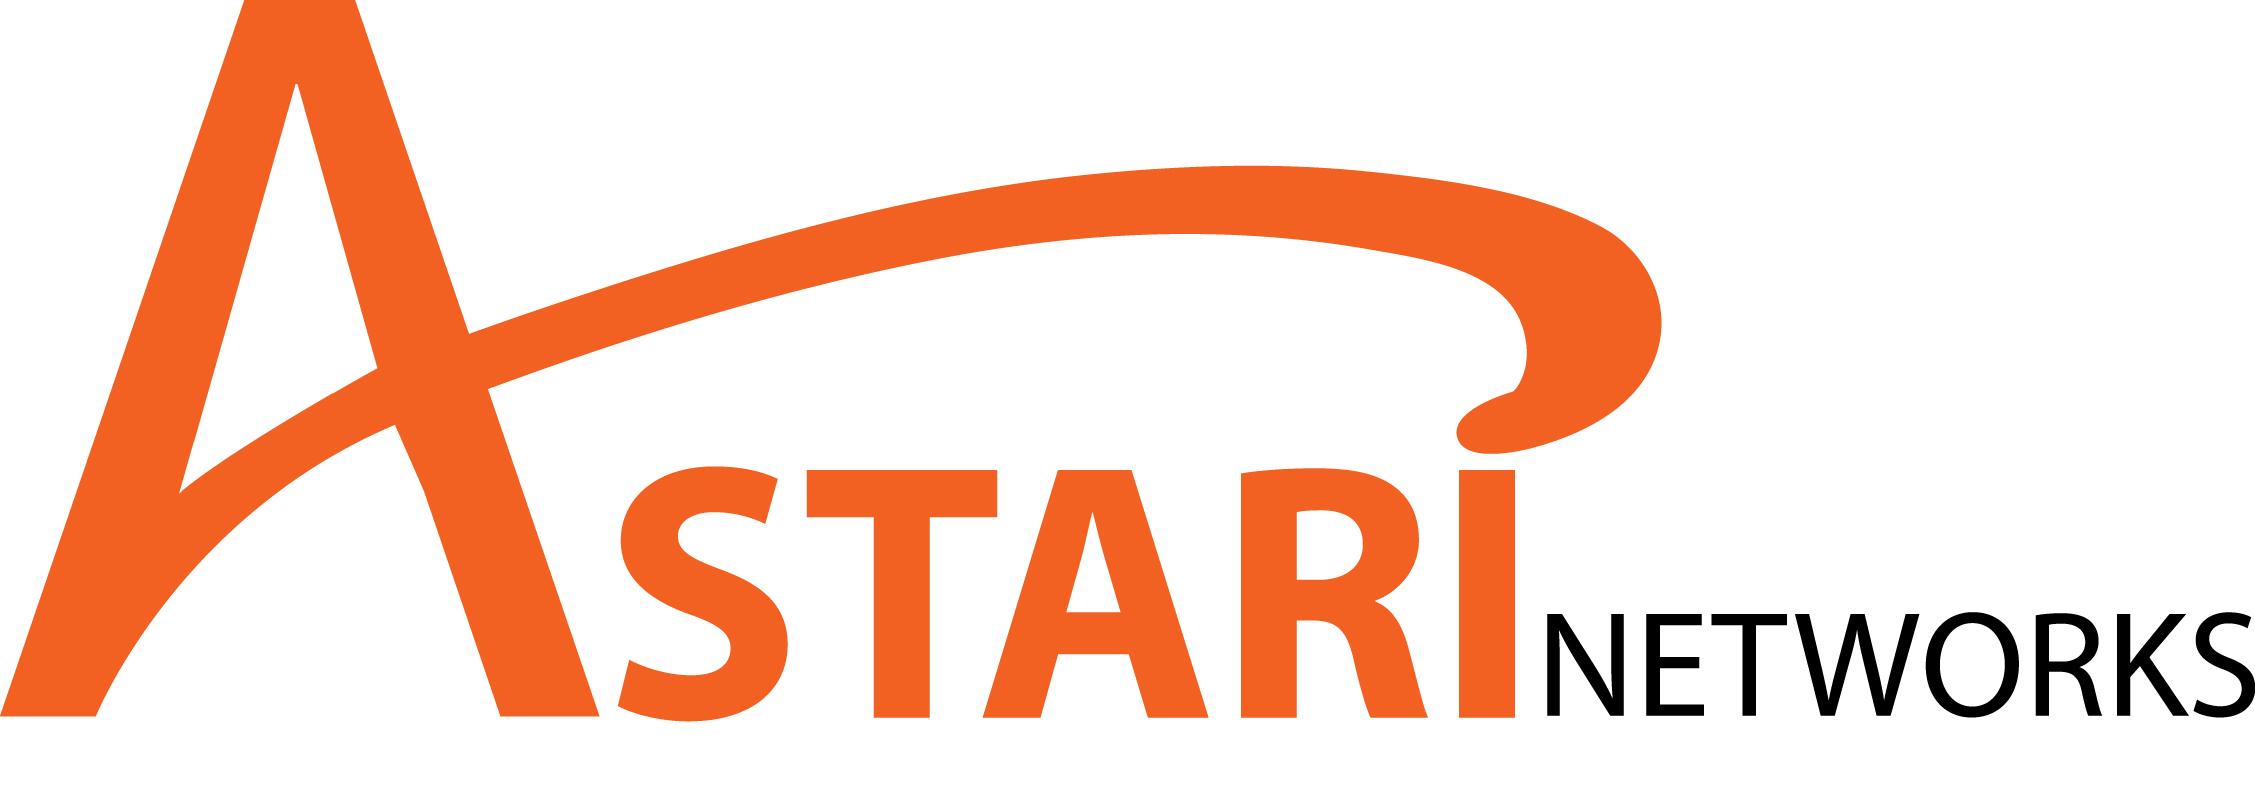 Astari Networks